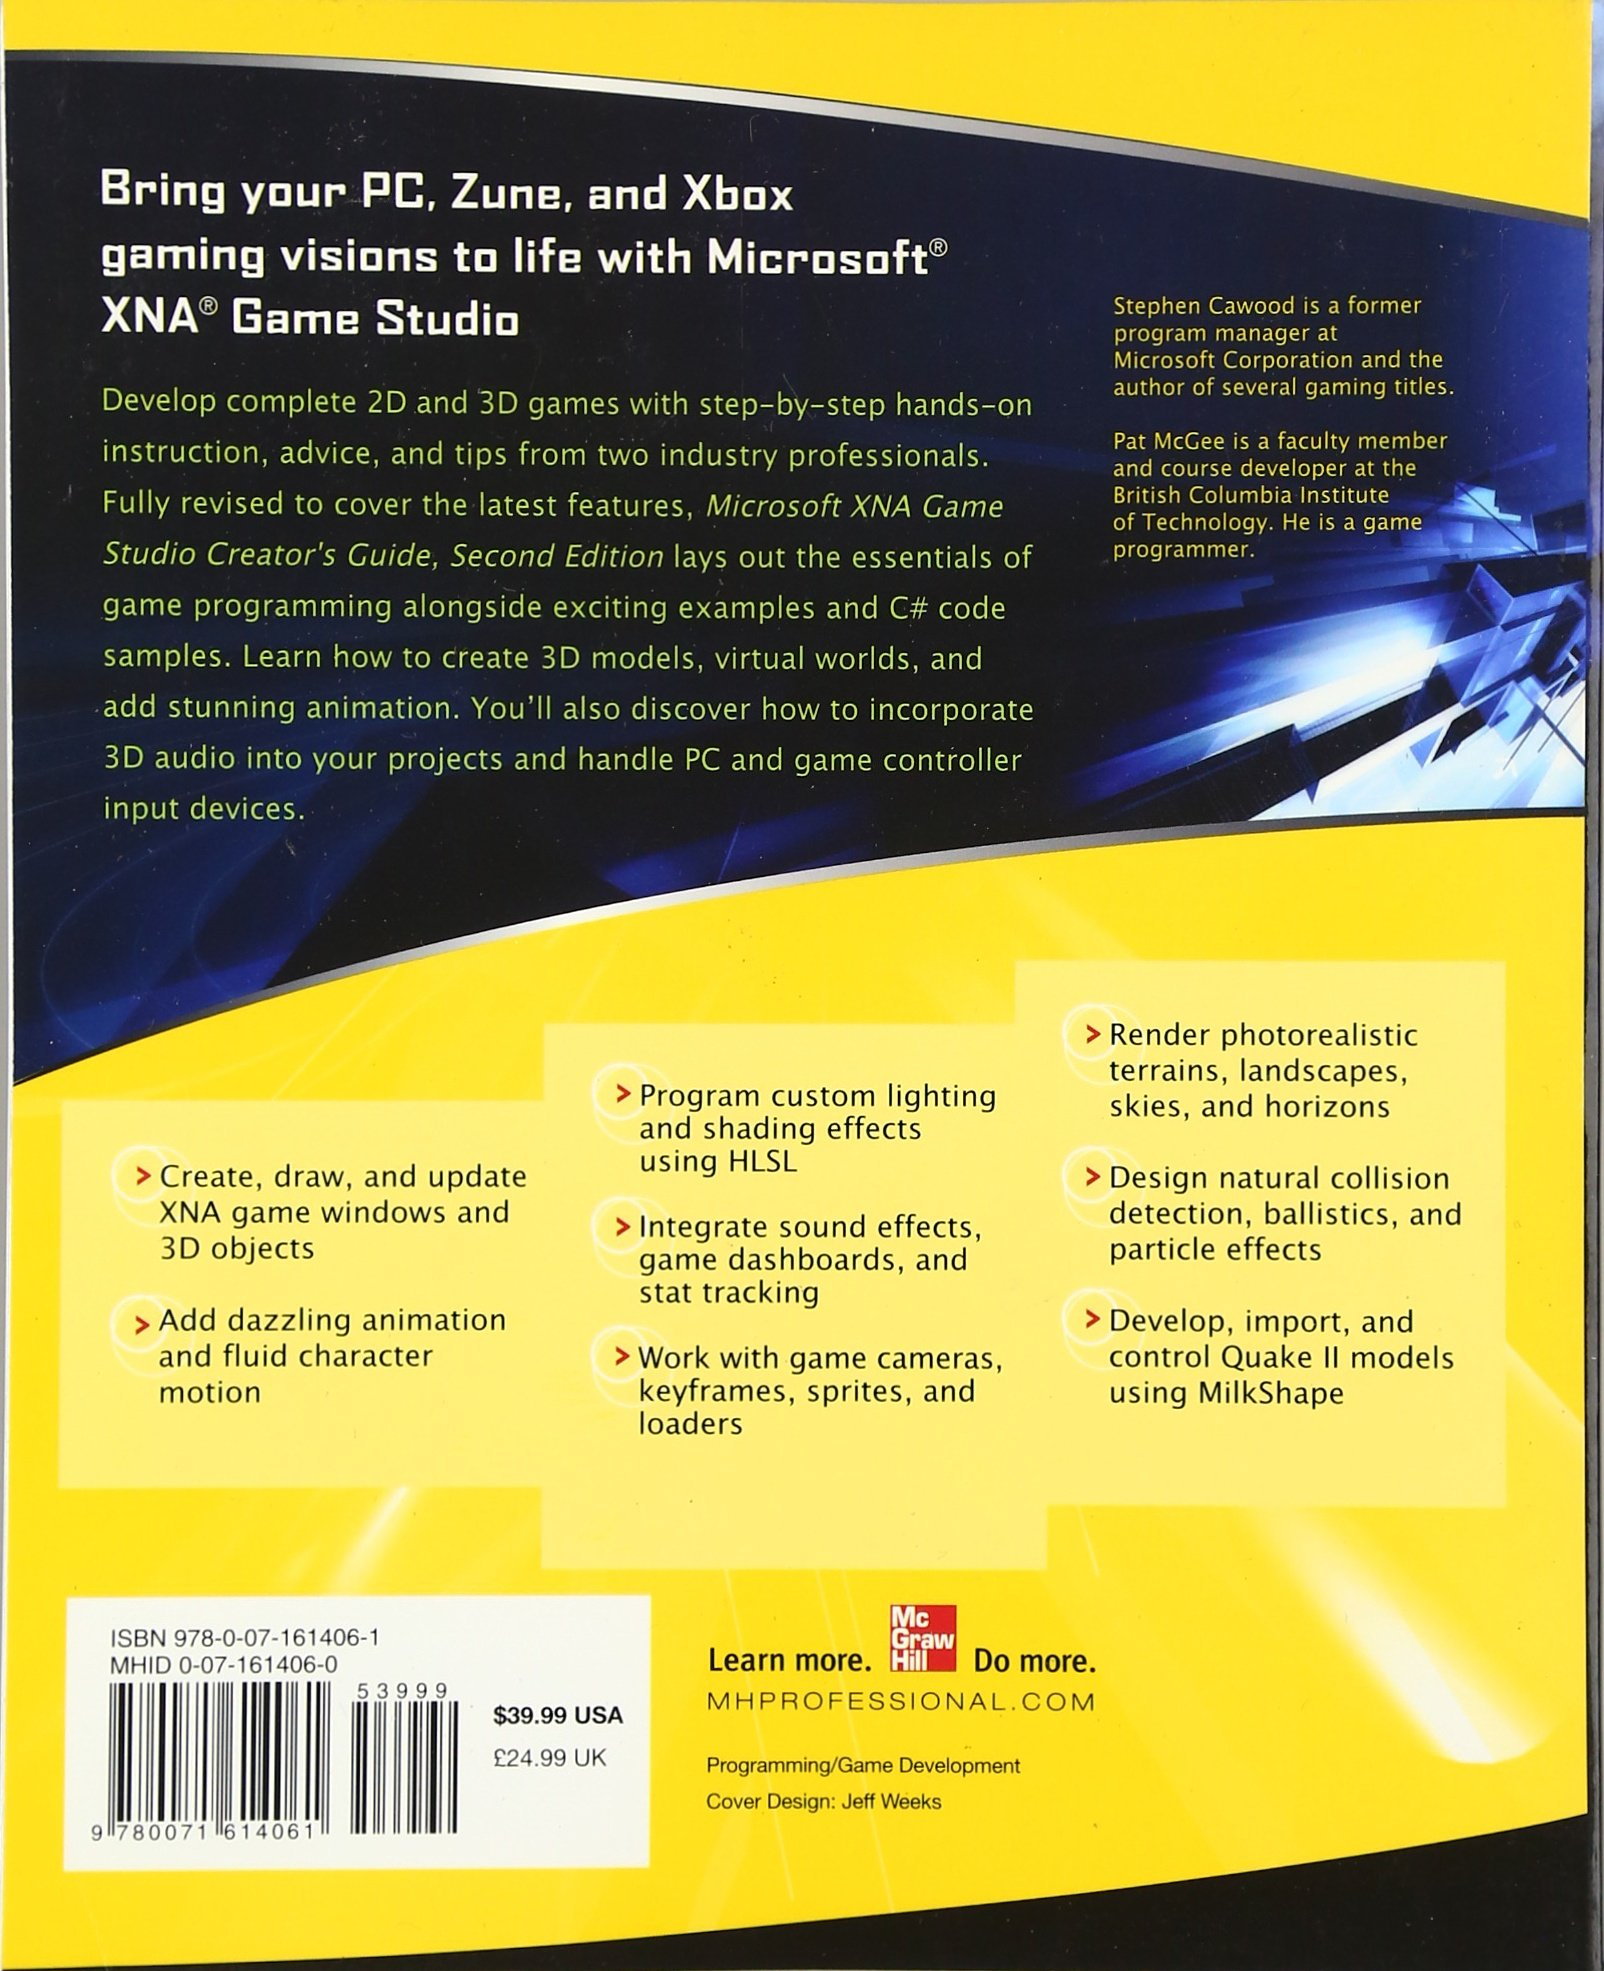 Microsoft xna game studio creator s guide second edition amazon co uk stephen cawood pat mcgee 9780071614061 books